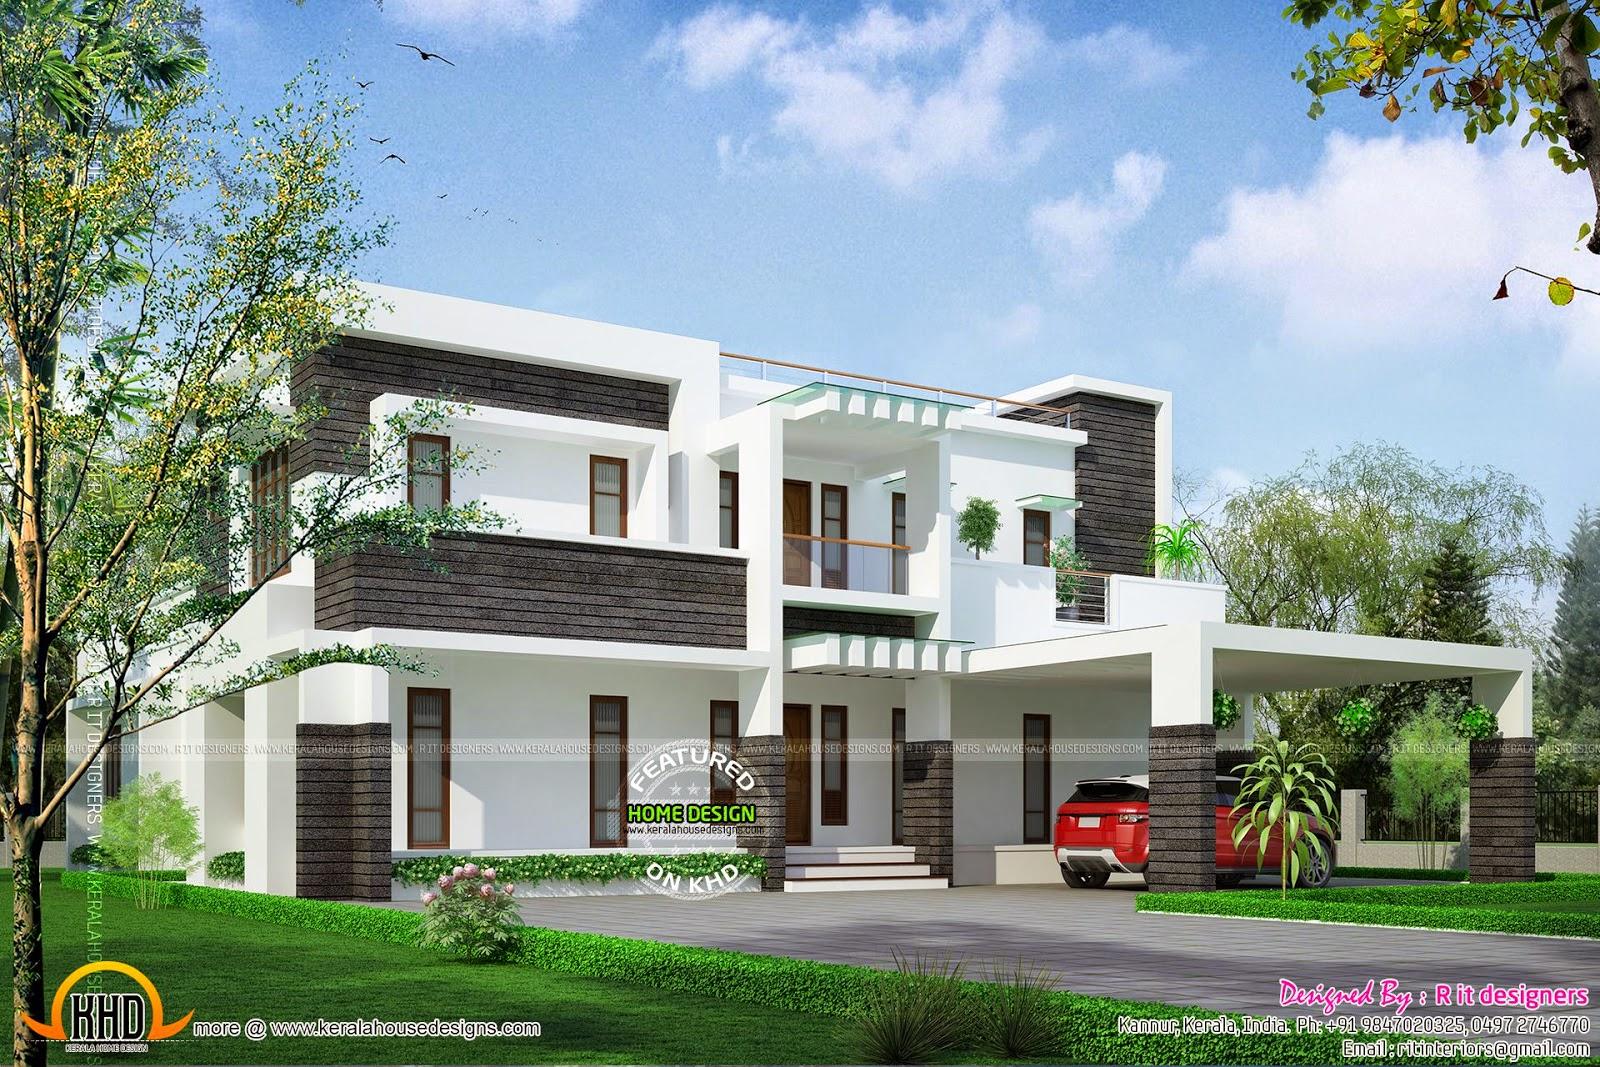 Architectural Design Of 120 Yard House | Modern Design on